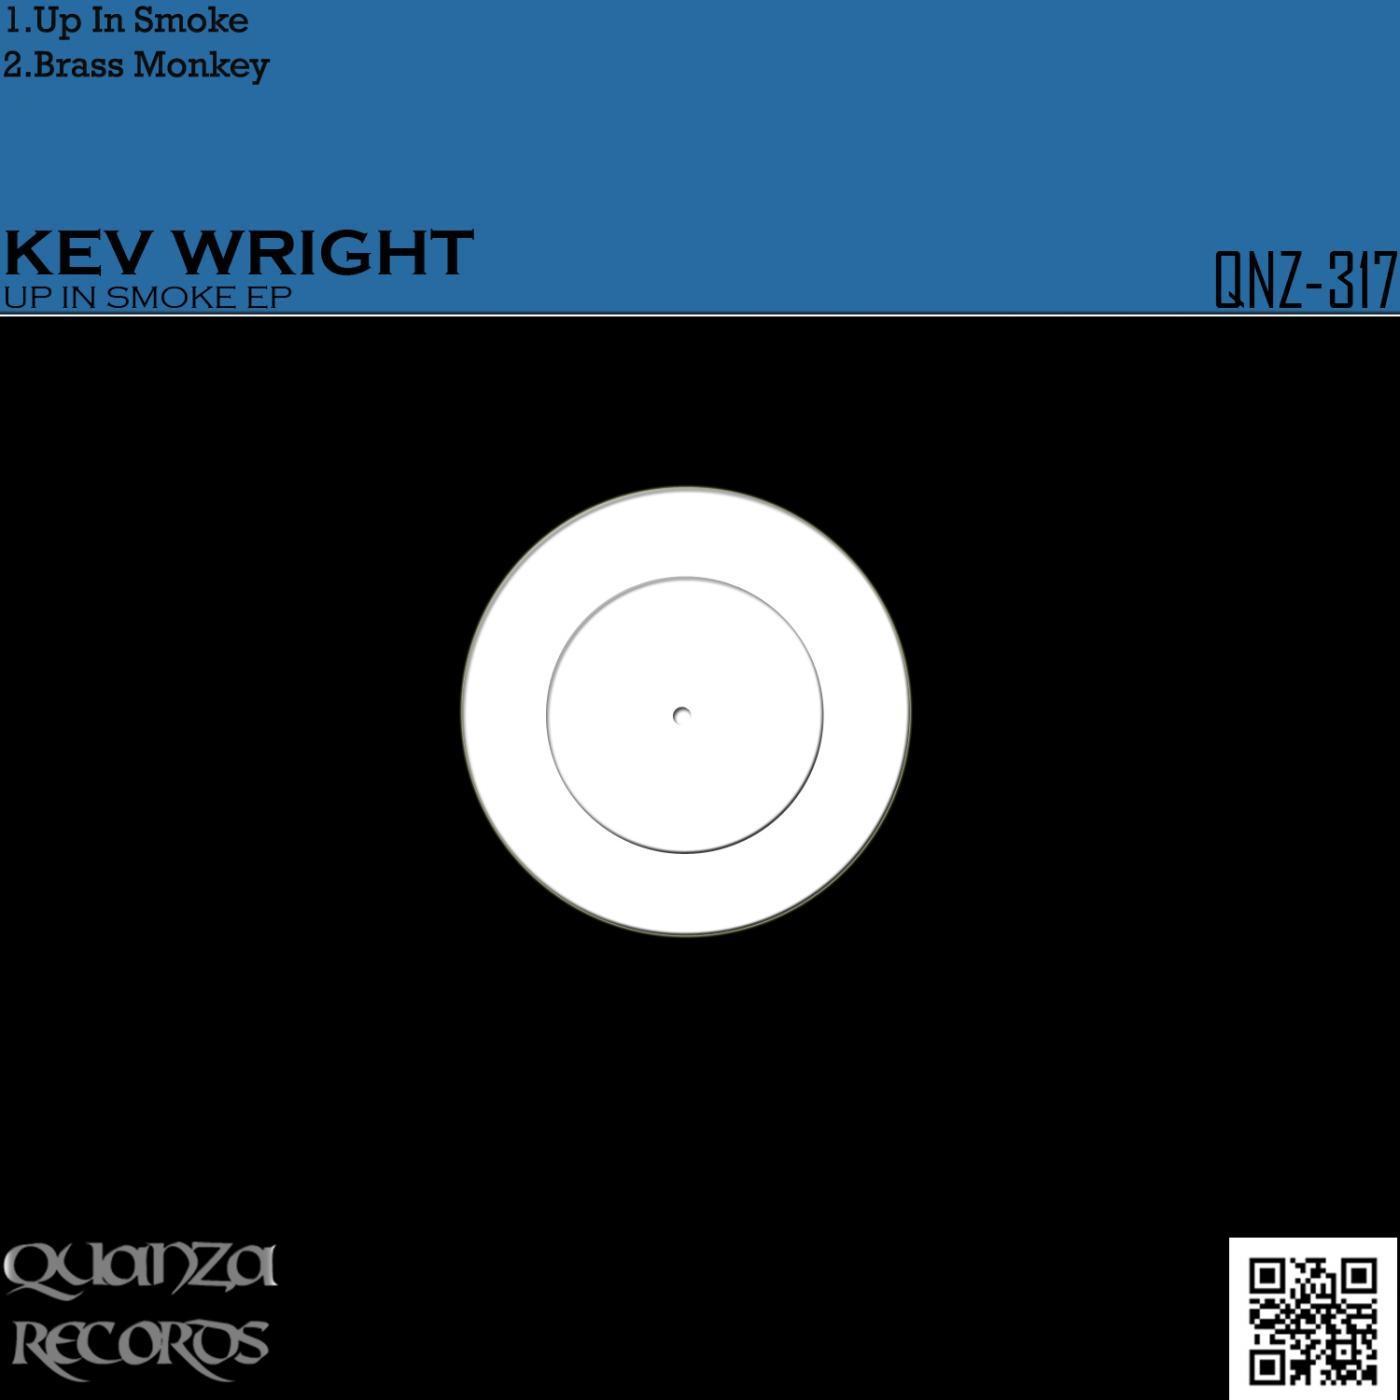 Kev Wright - Brass Monkey (Original Mix)